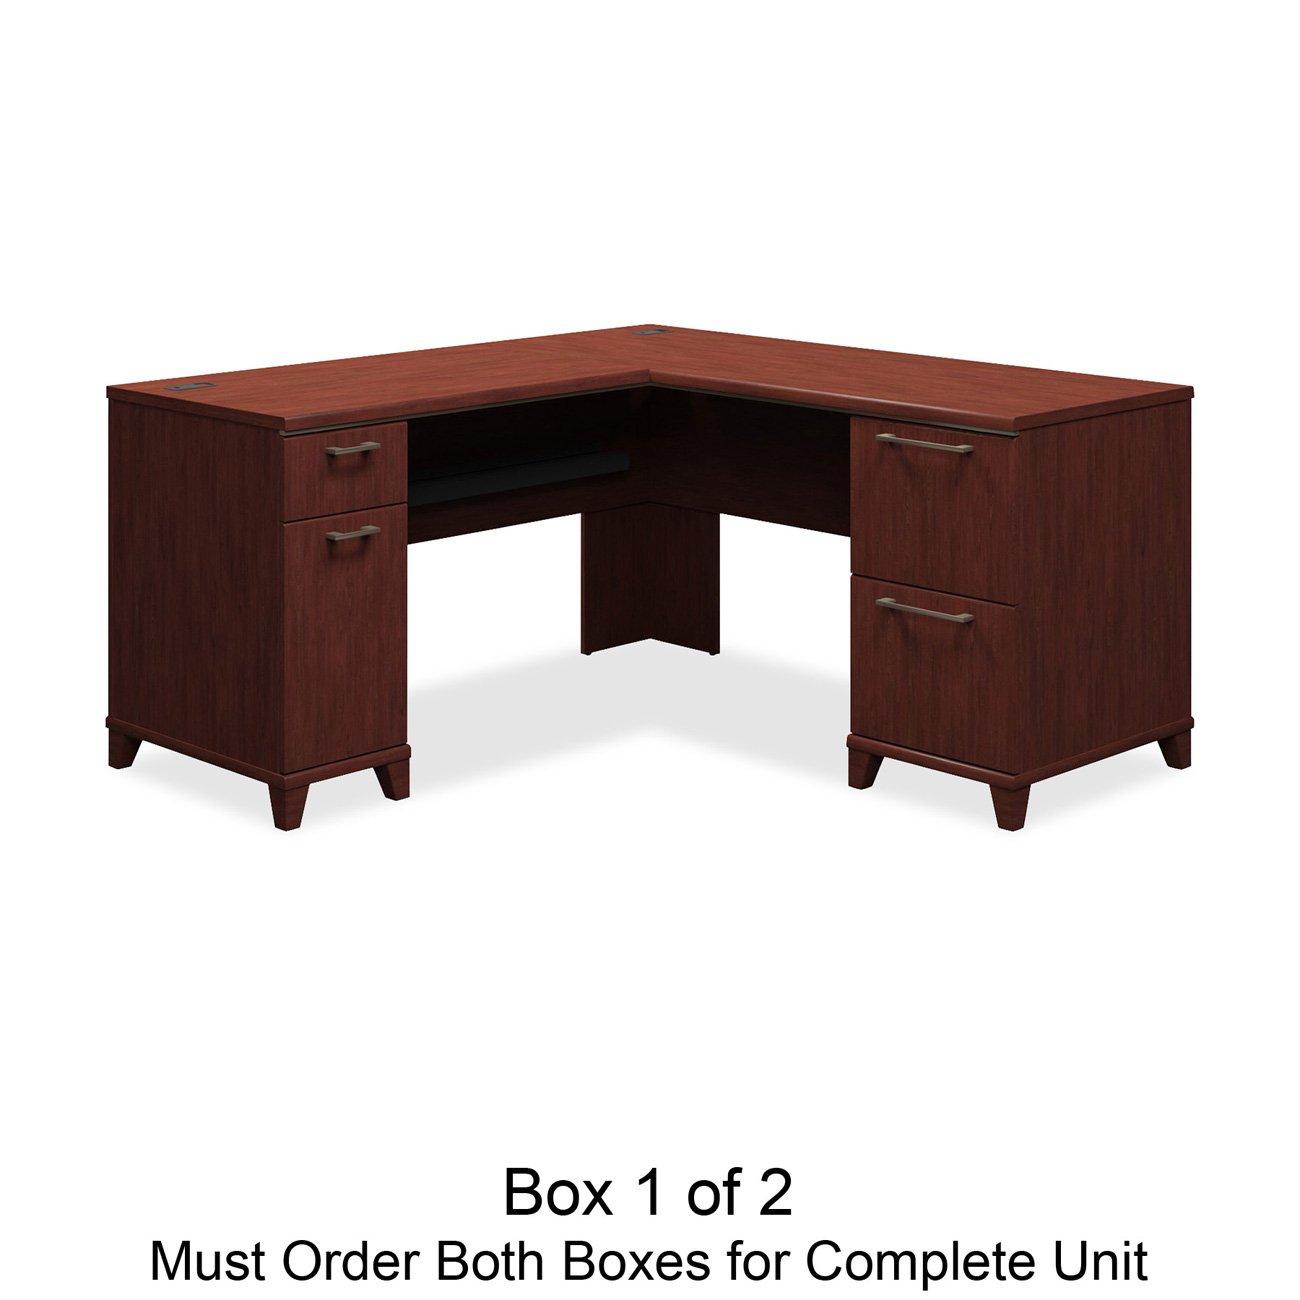 Bush L Desk Part - 37: Amazon.com: Bush L-Shaped Desk, 60-Inch By 60-Inch By 30-Inch, Mocha:  Kitchen U0026 Dining